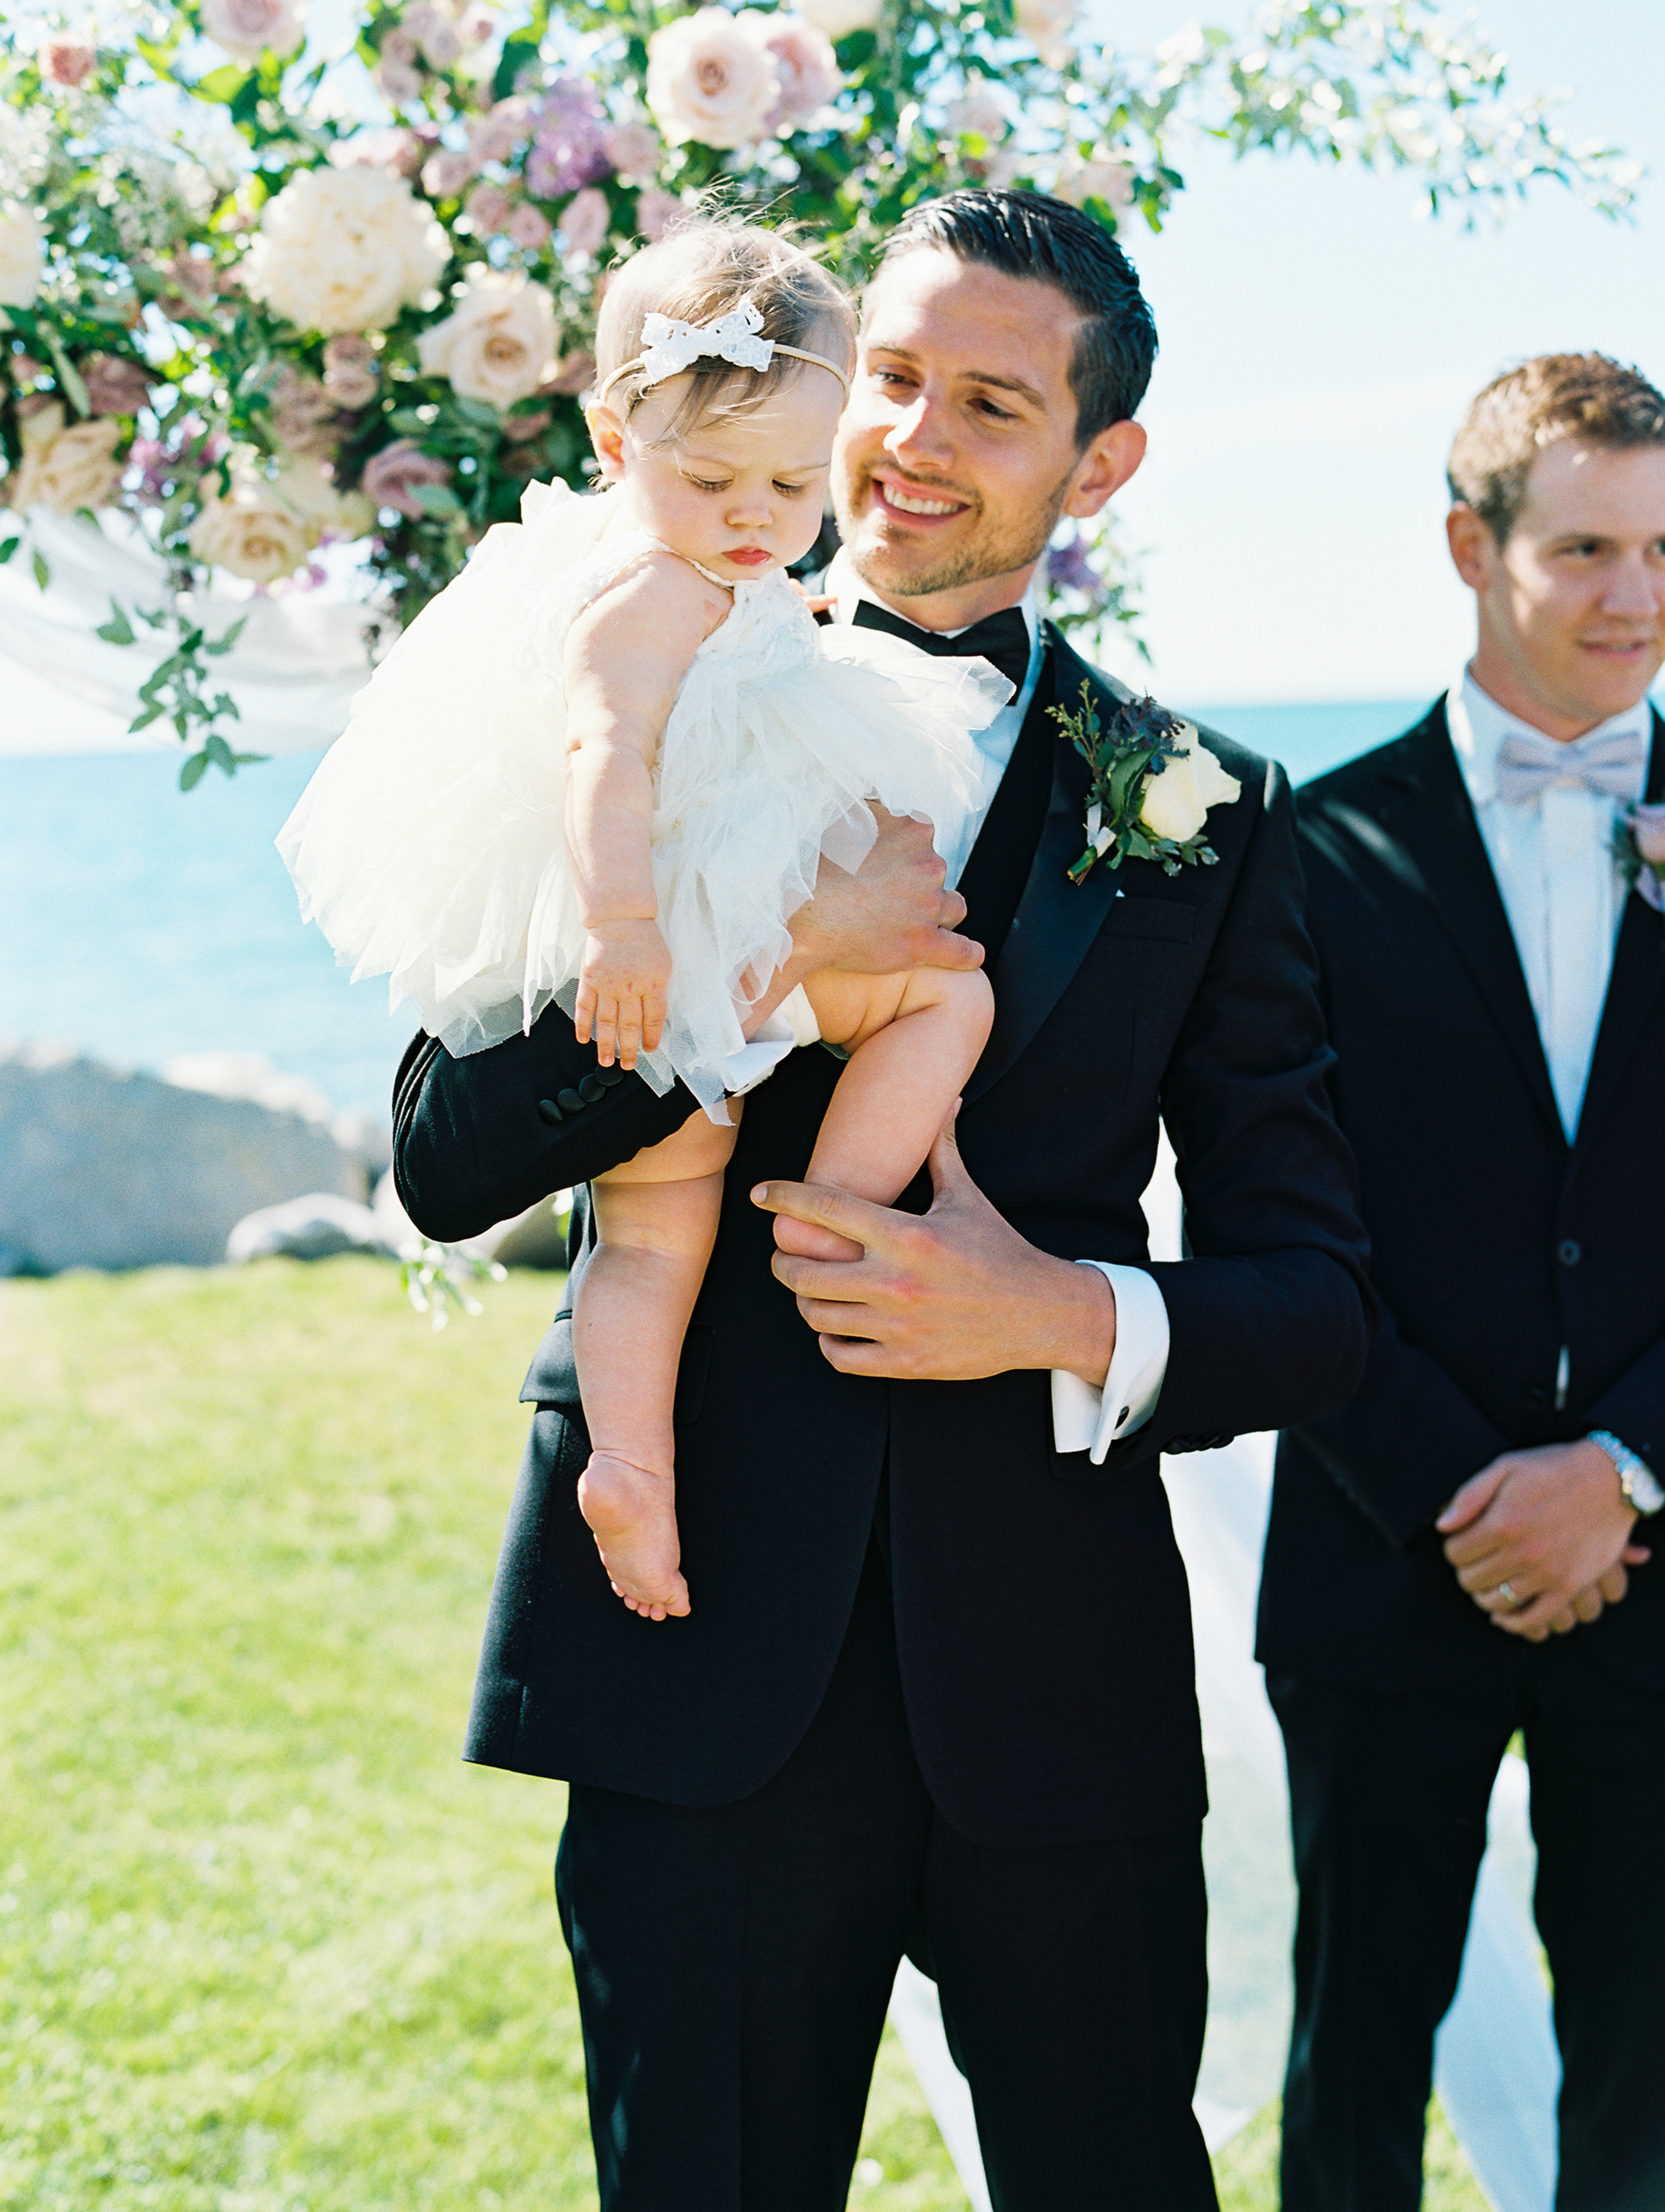 Noss+Wedding+Ceremony-70.jpg